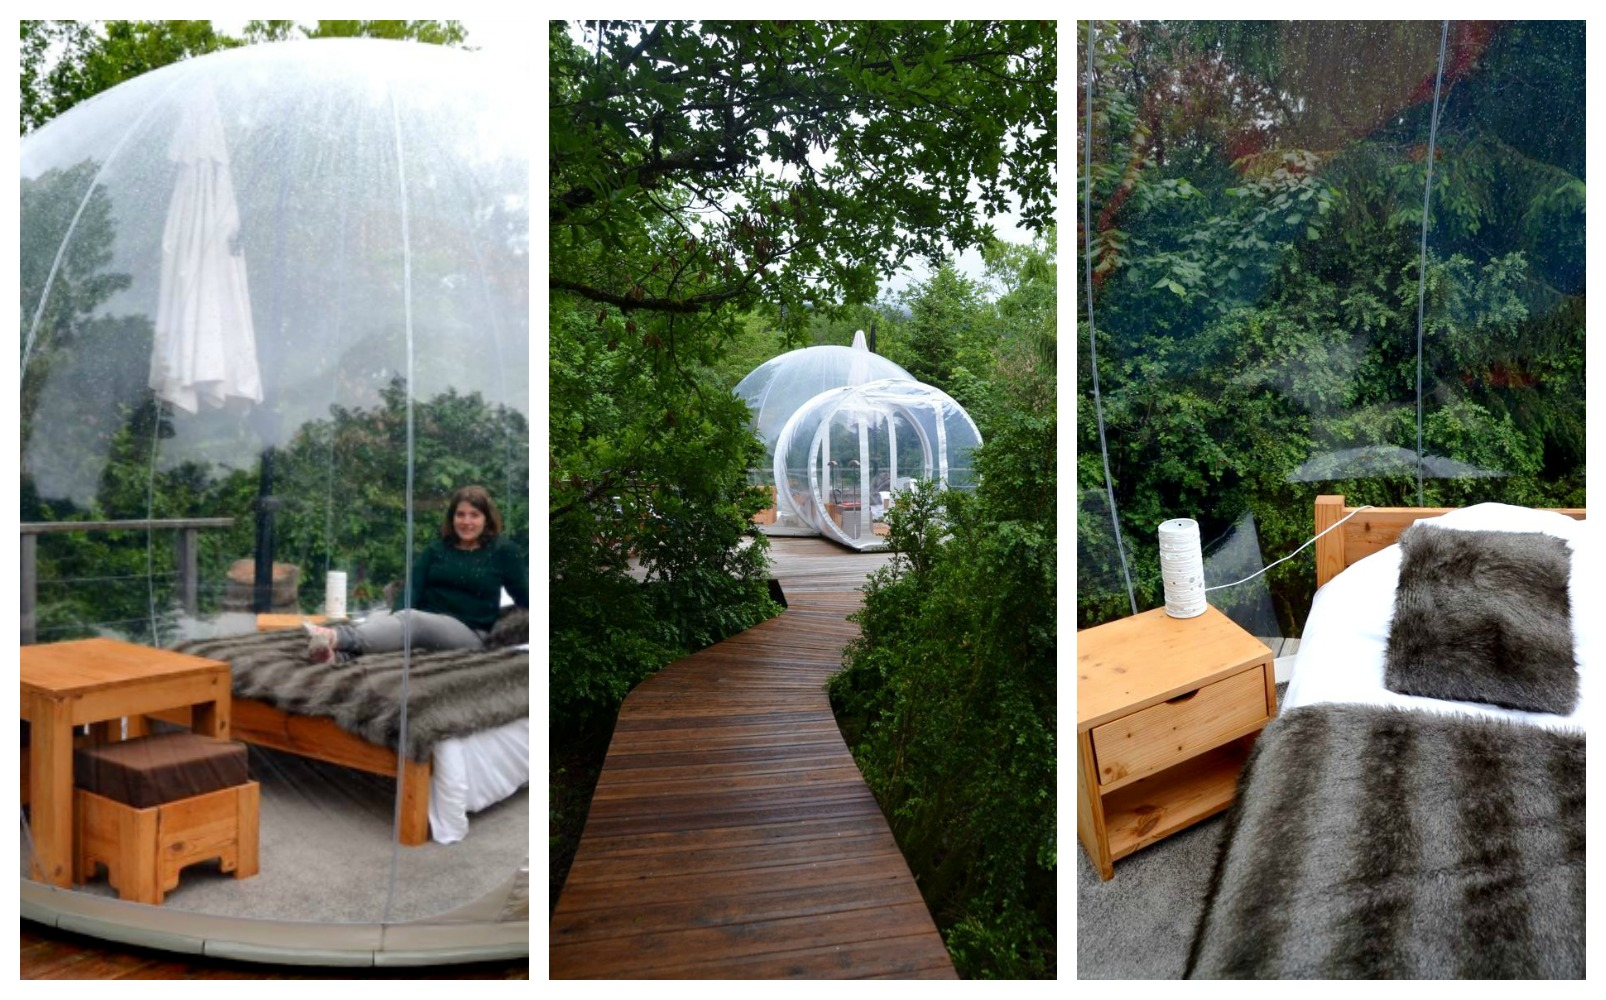 h bergement insolite dormir dans une bulle transparente. Black Bedroom Furniture Sets. Home Design Ideas